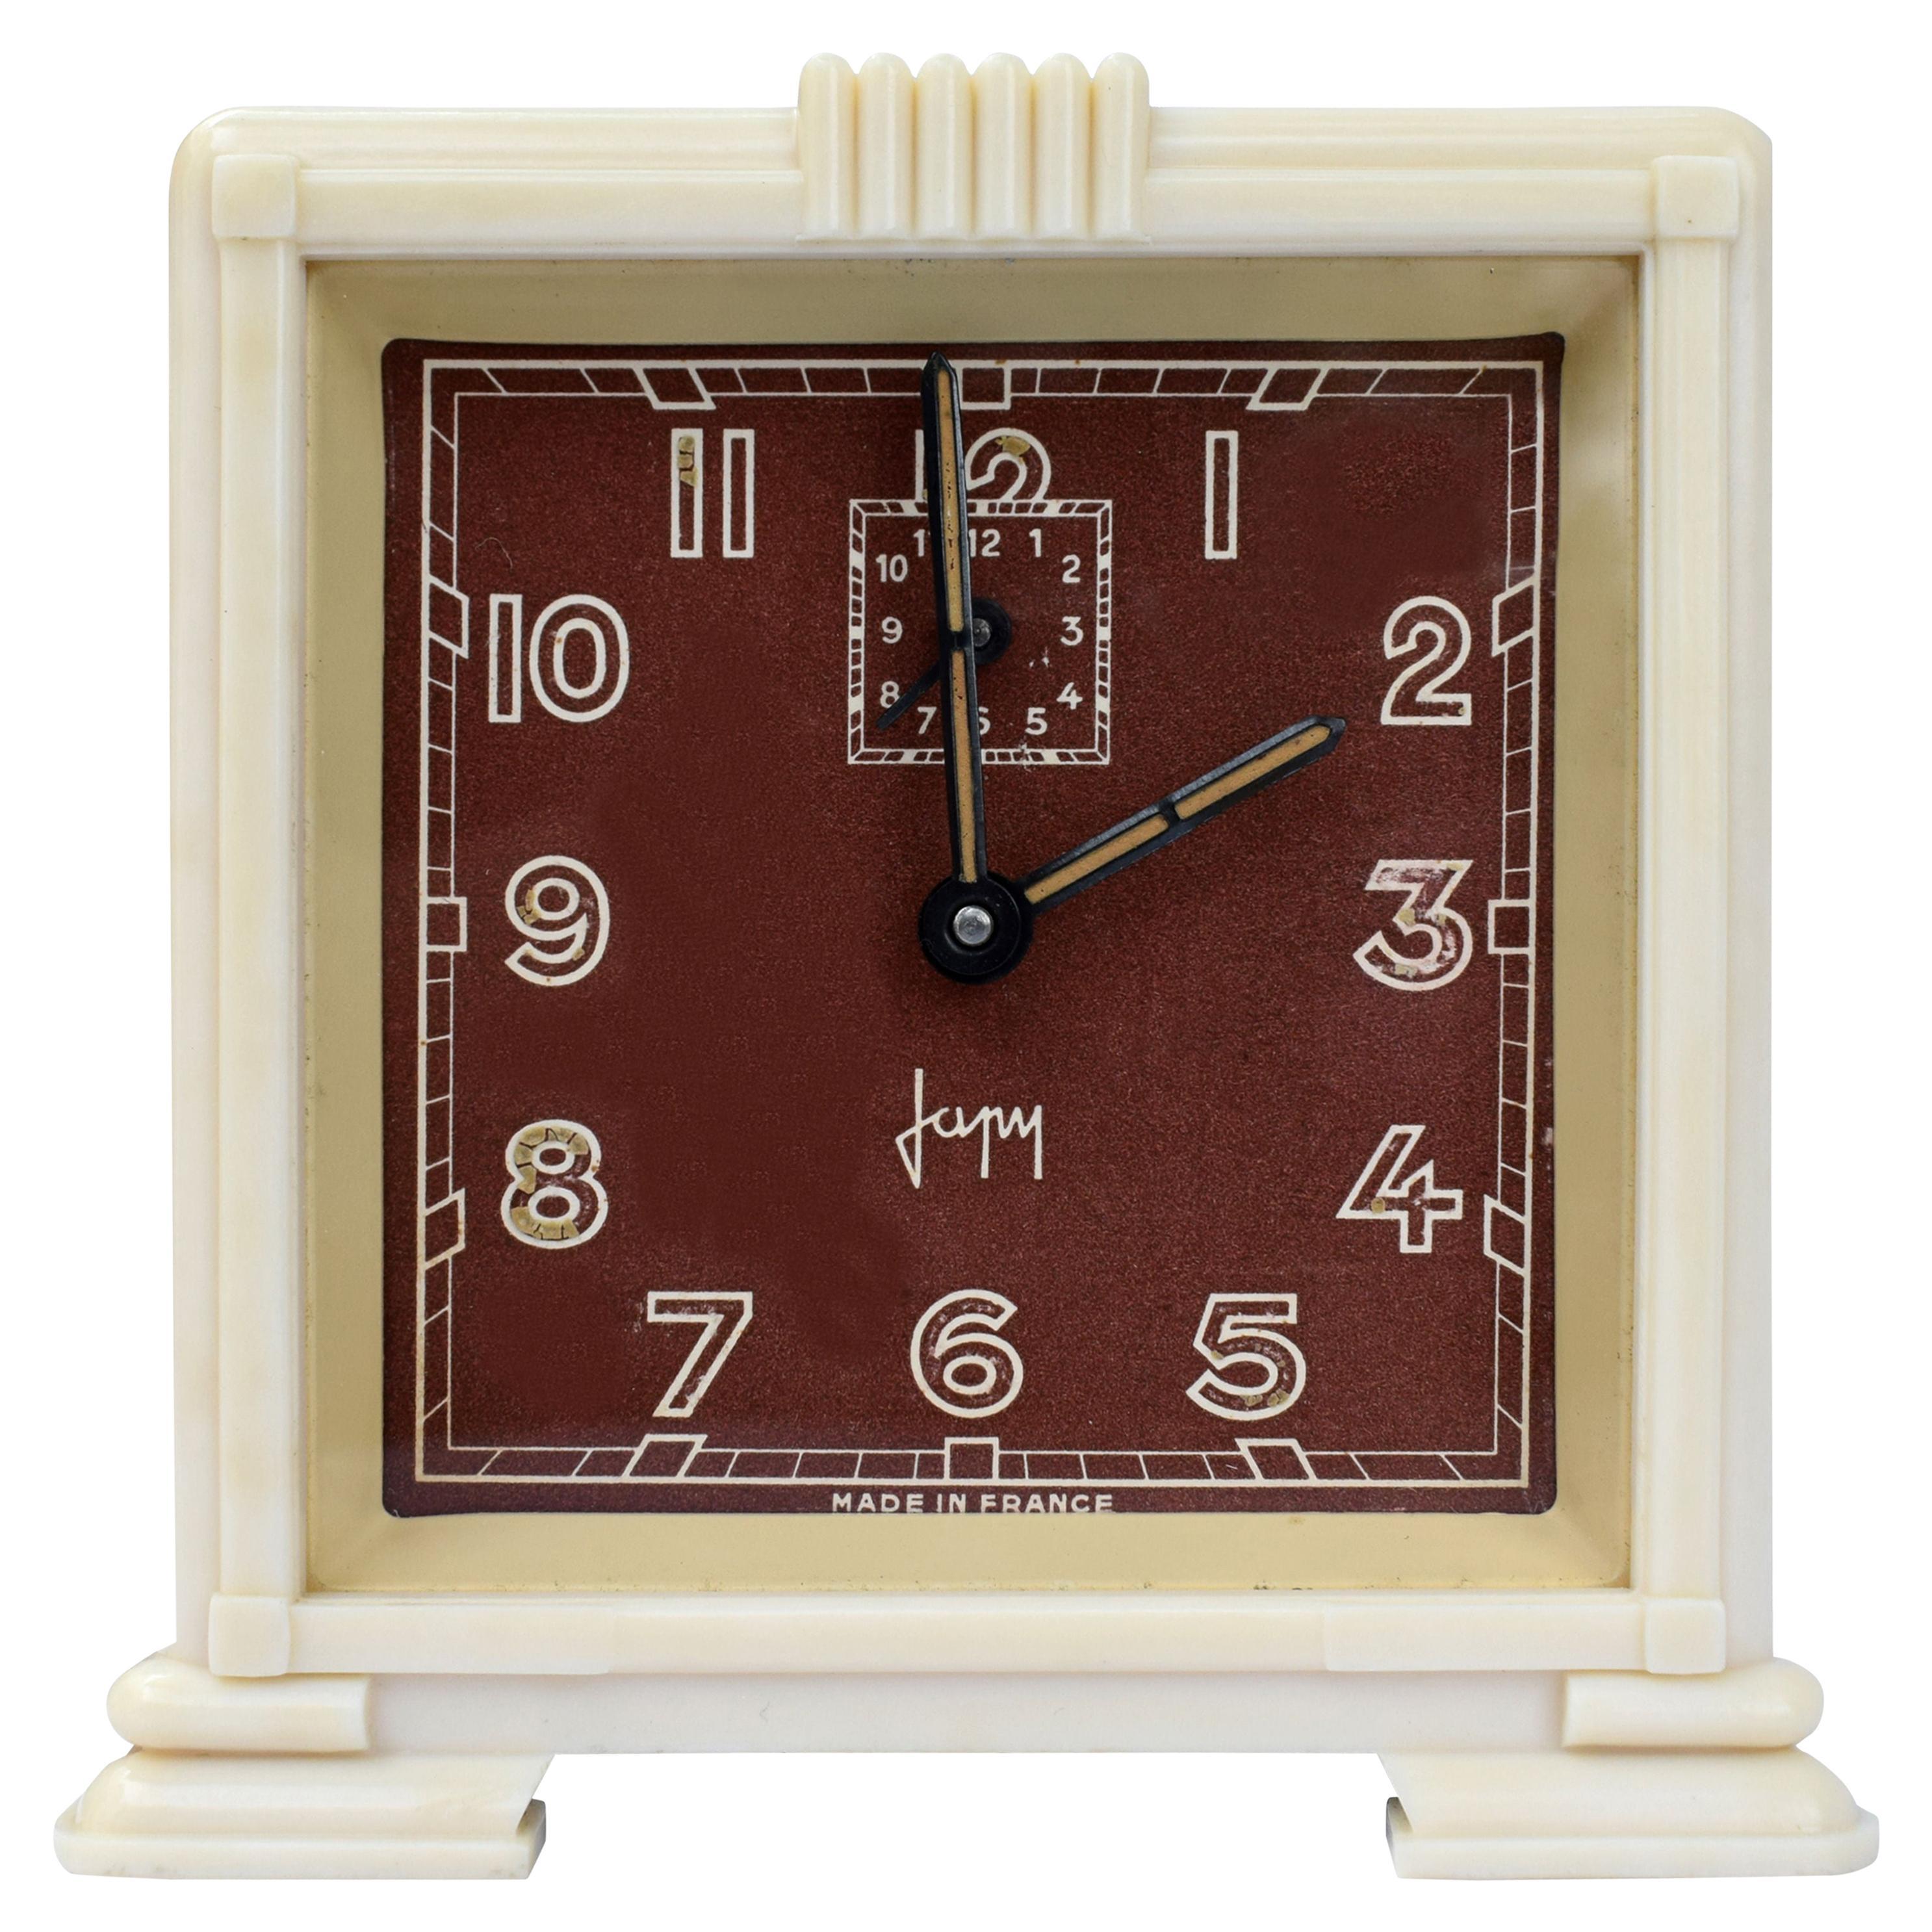 Art Deco Streamline Cream Bakelite Alarm Clock by Japy, circa 1930